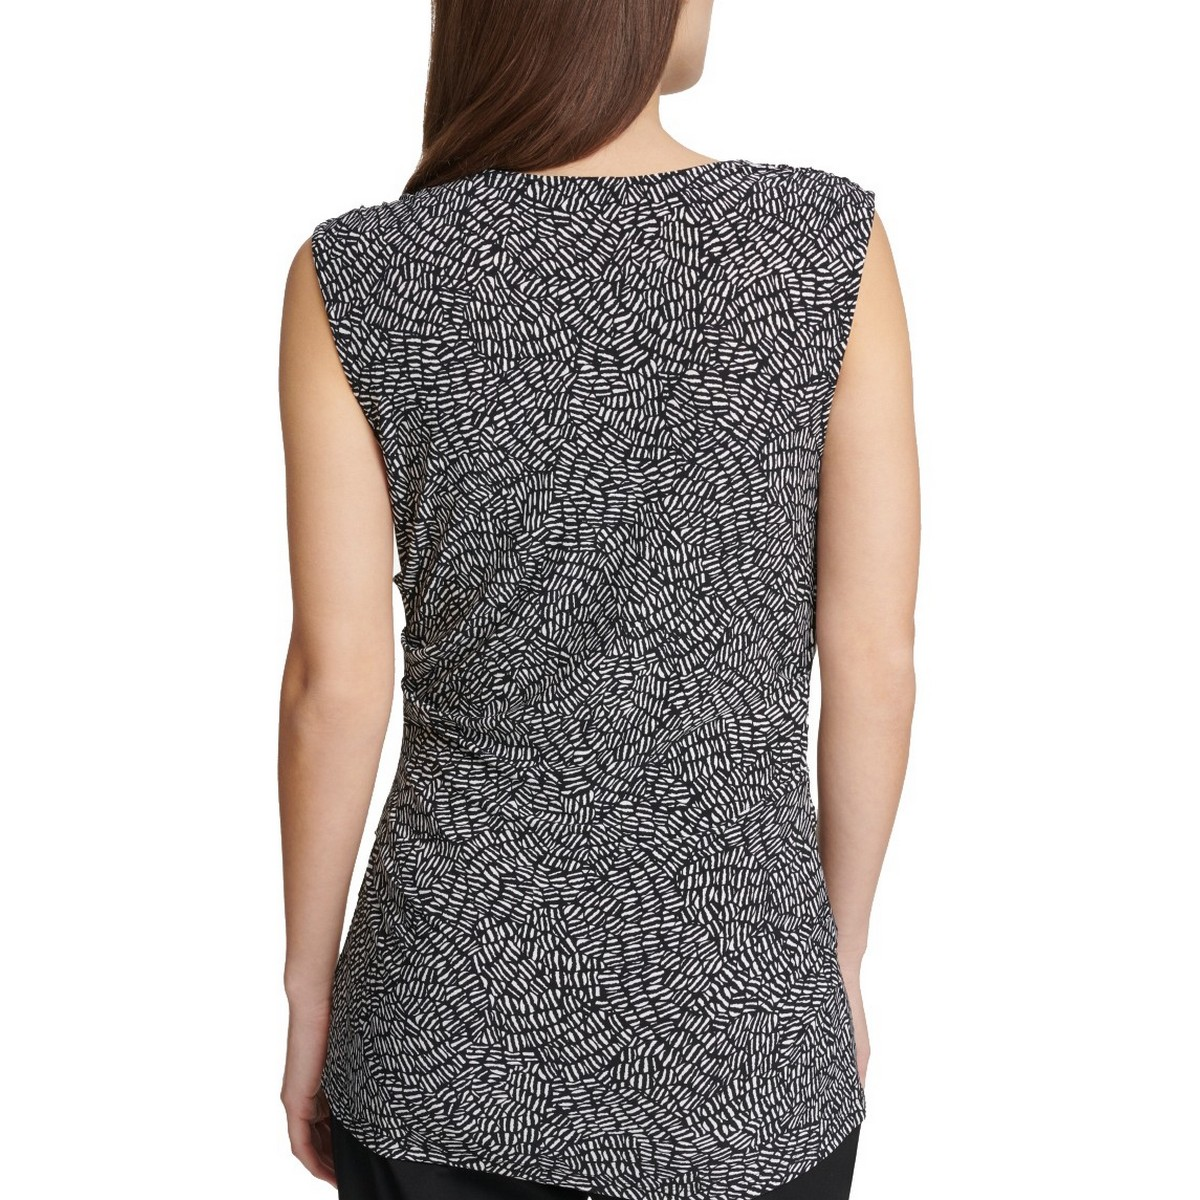 DKNY-NEW-Women-039-s-Printed-Sleeveless-Ruched-Blouse-Shirt-Top-TEDO thumbnail 4